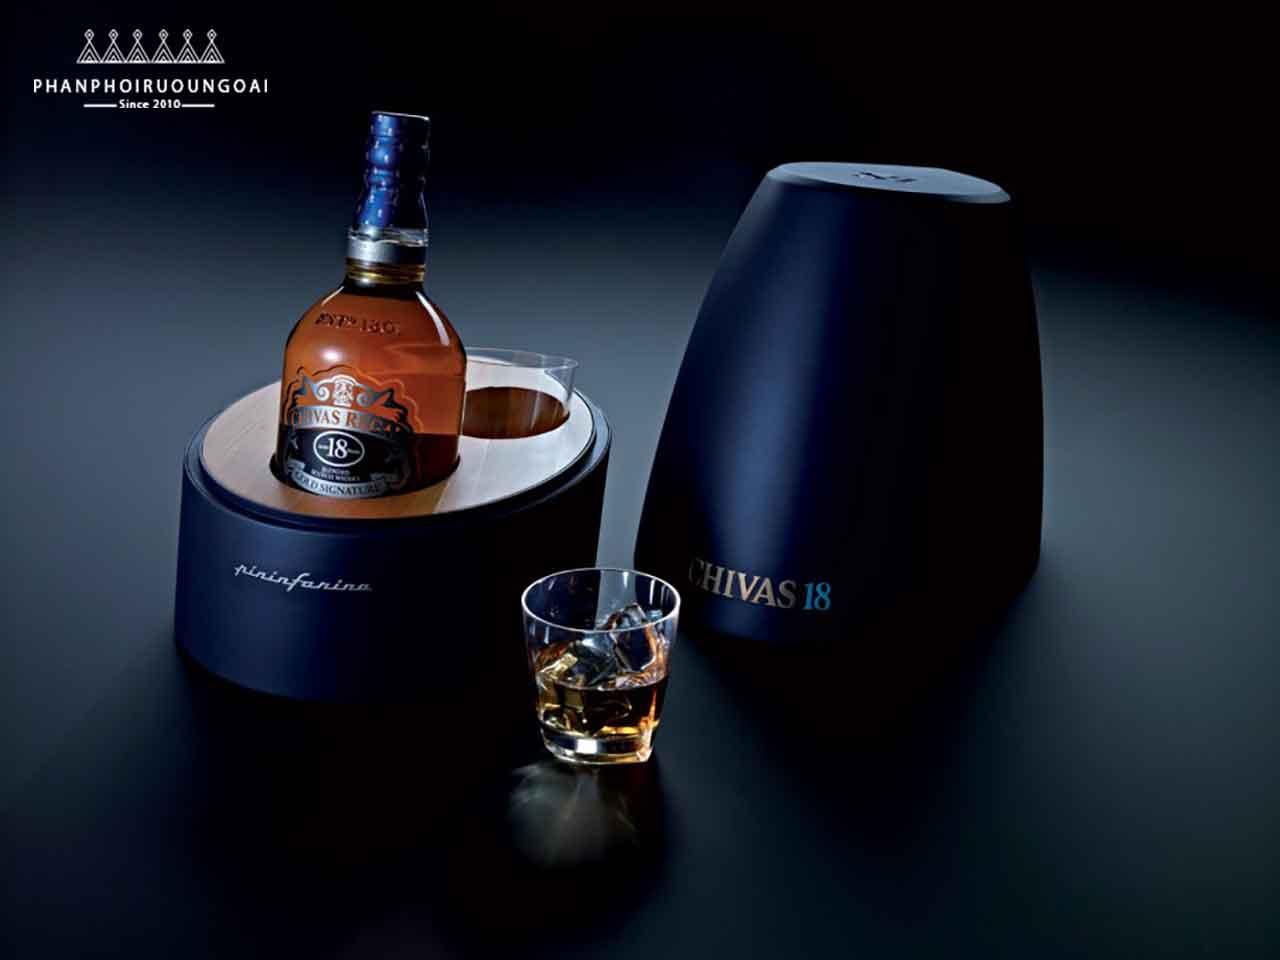 Rượu Chivas 18 Pininfarina Level 1 và ly whisky